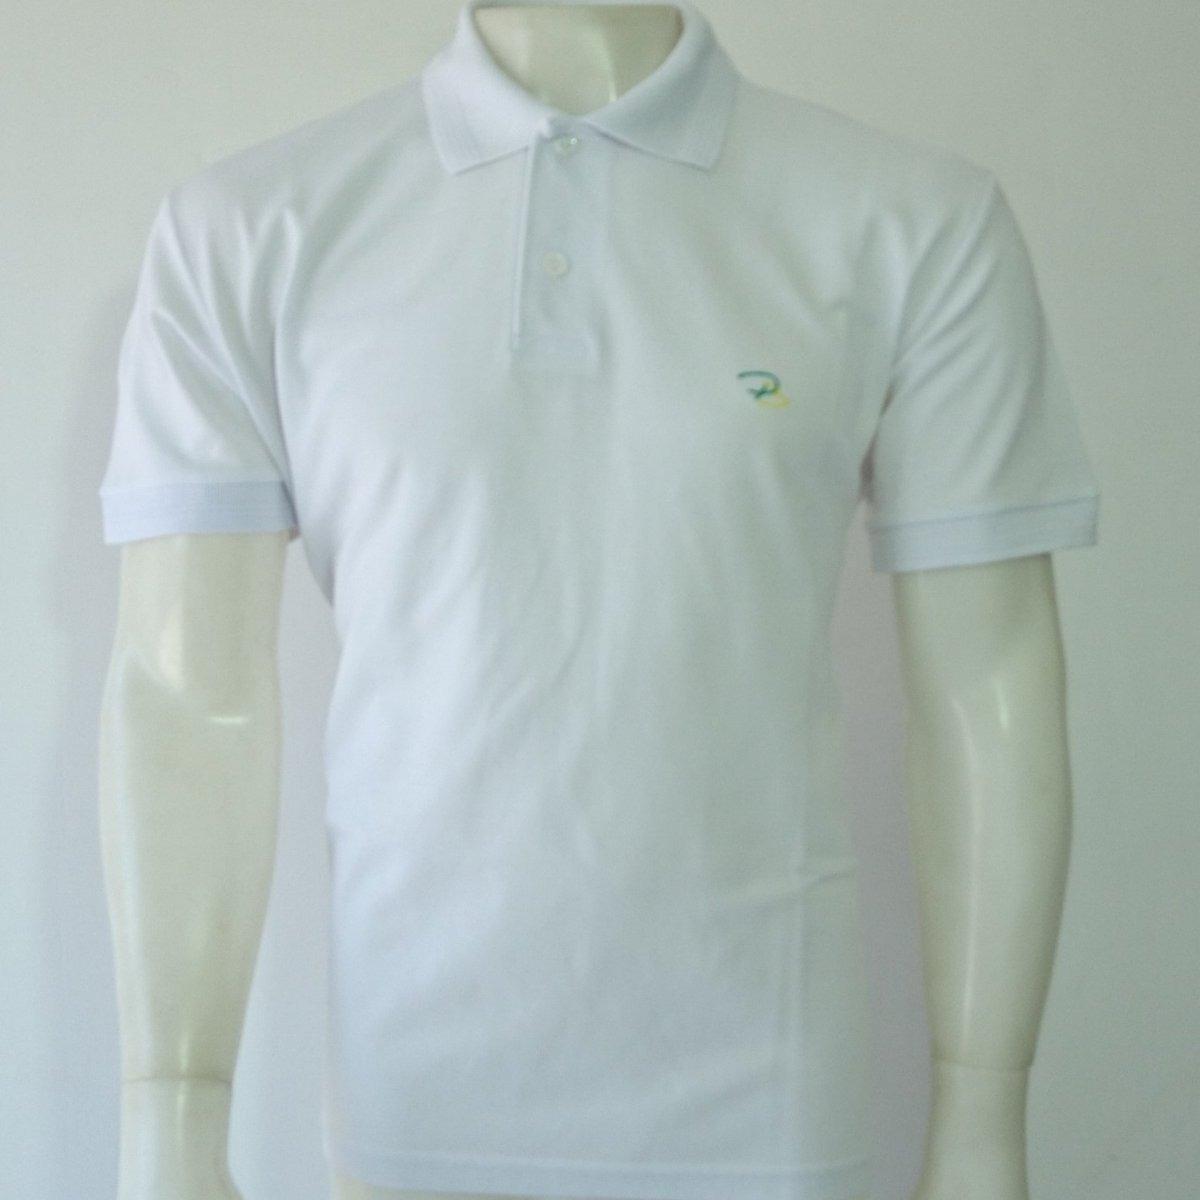 9da97691f Camisa Polo Branca Marca Padrão Brasil P m g gg xxg - R  34